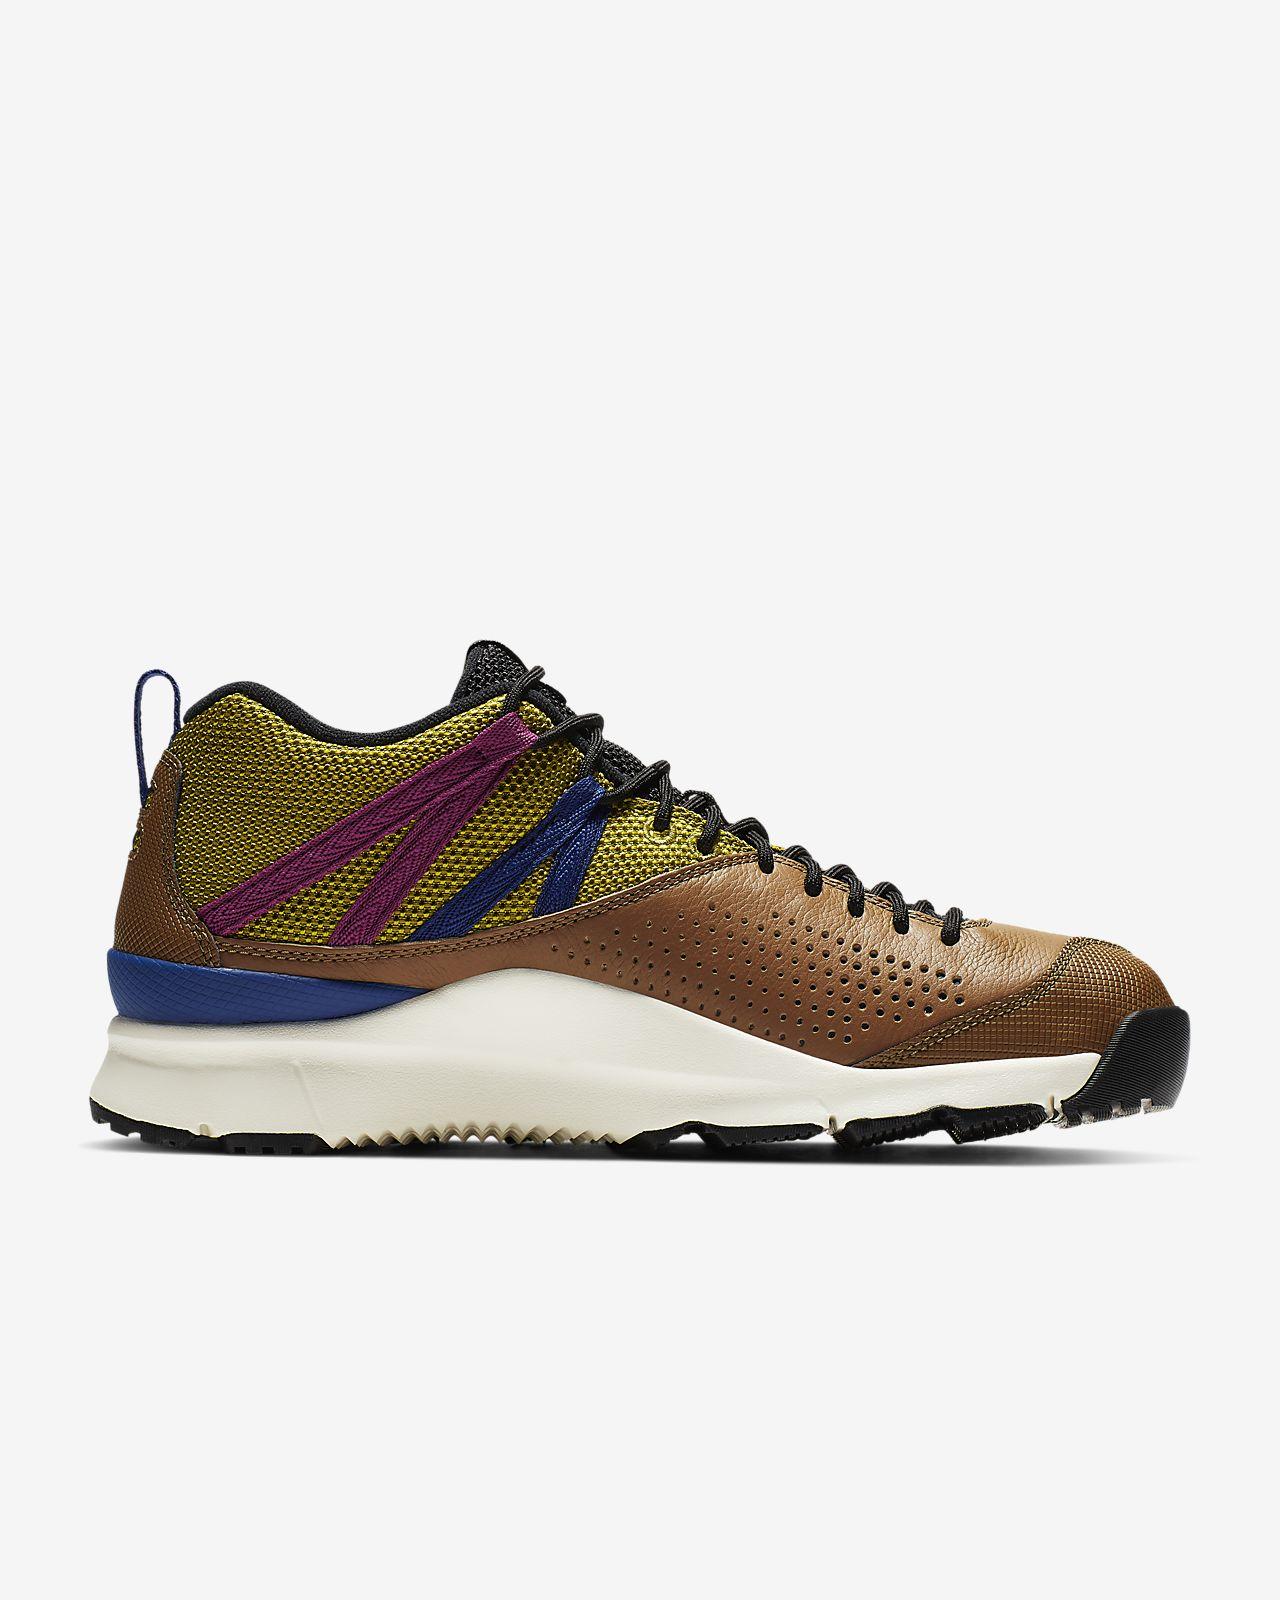 Nike Mens Okwahn II Energy Hiking, Trail Shoes Leather Lifestyle